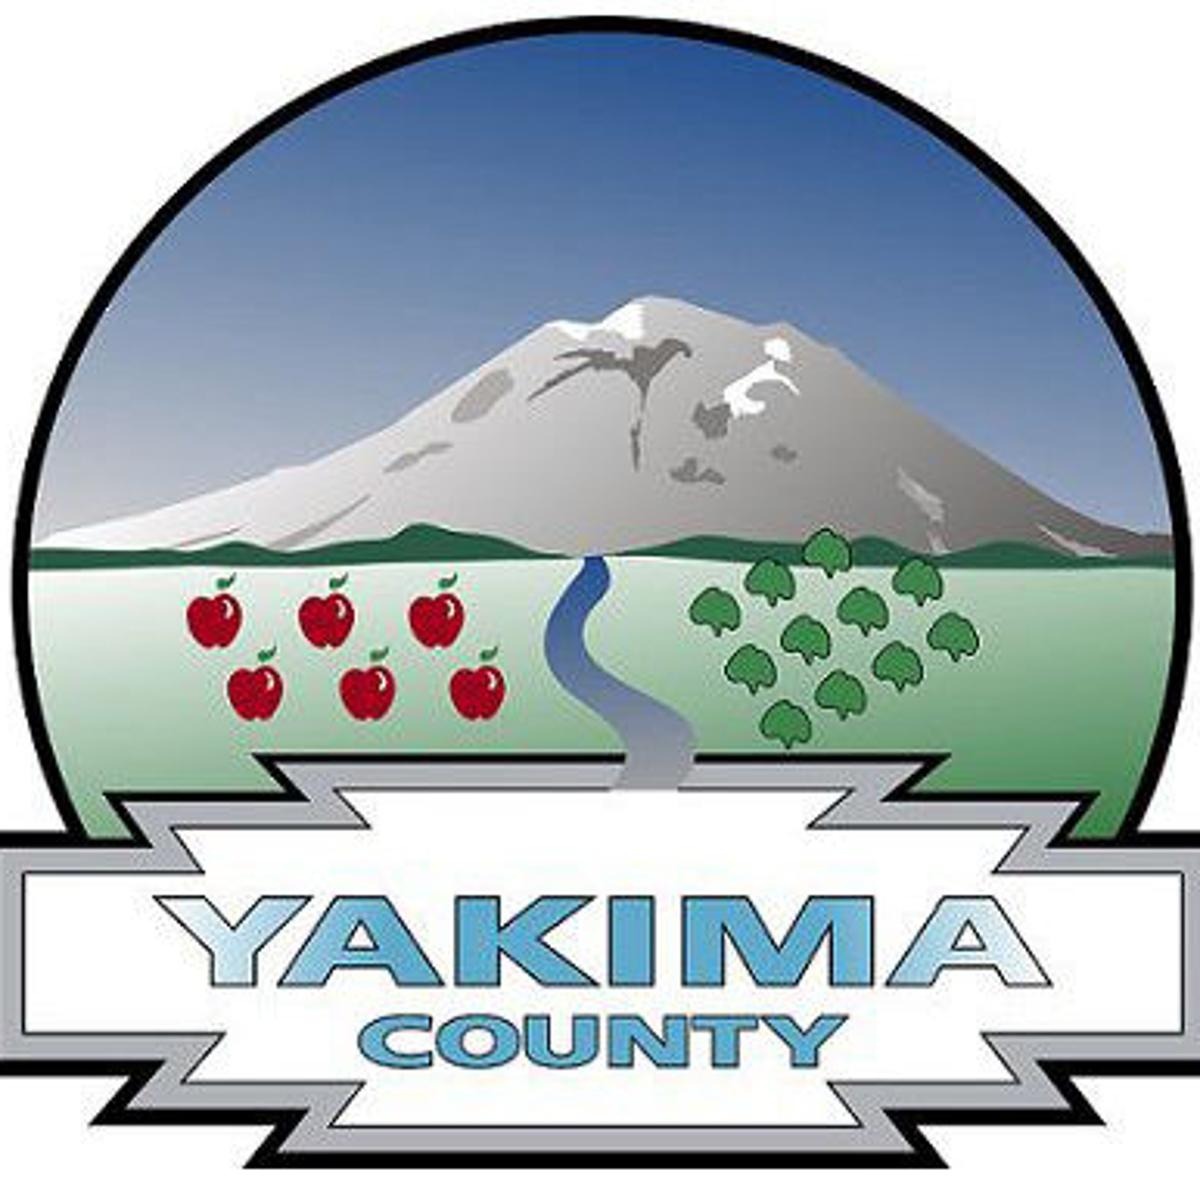 Yakima County Department of Corrections logo